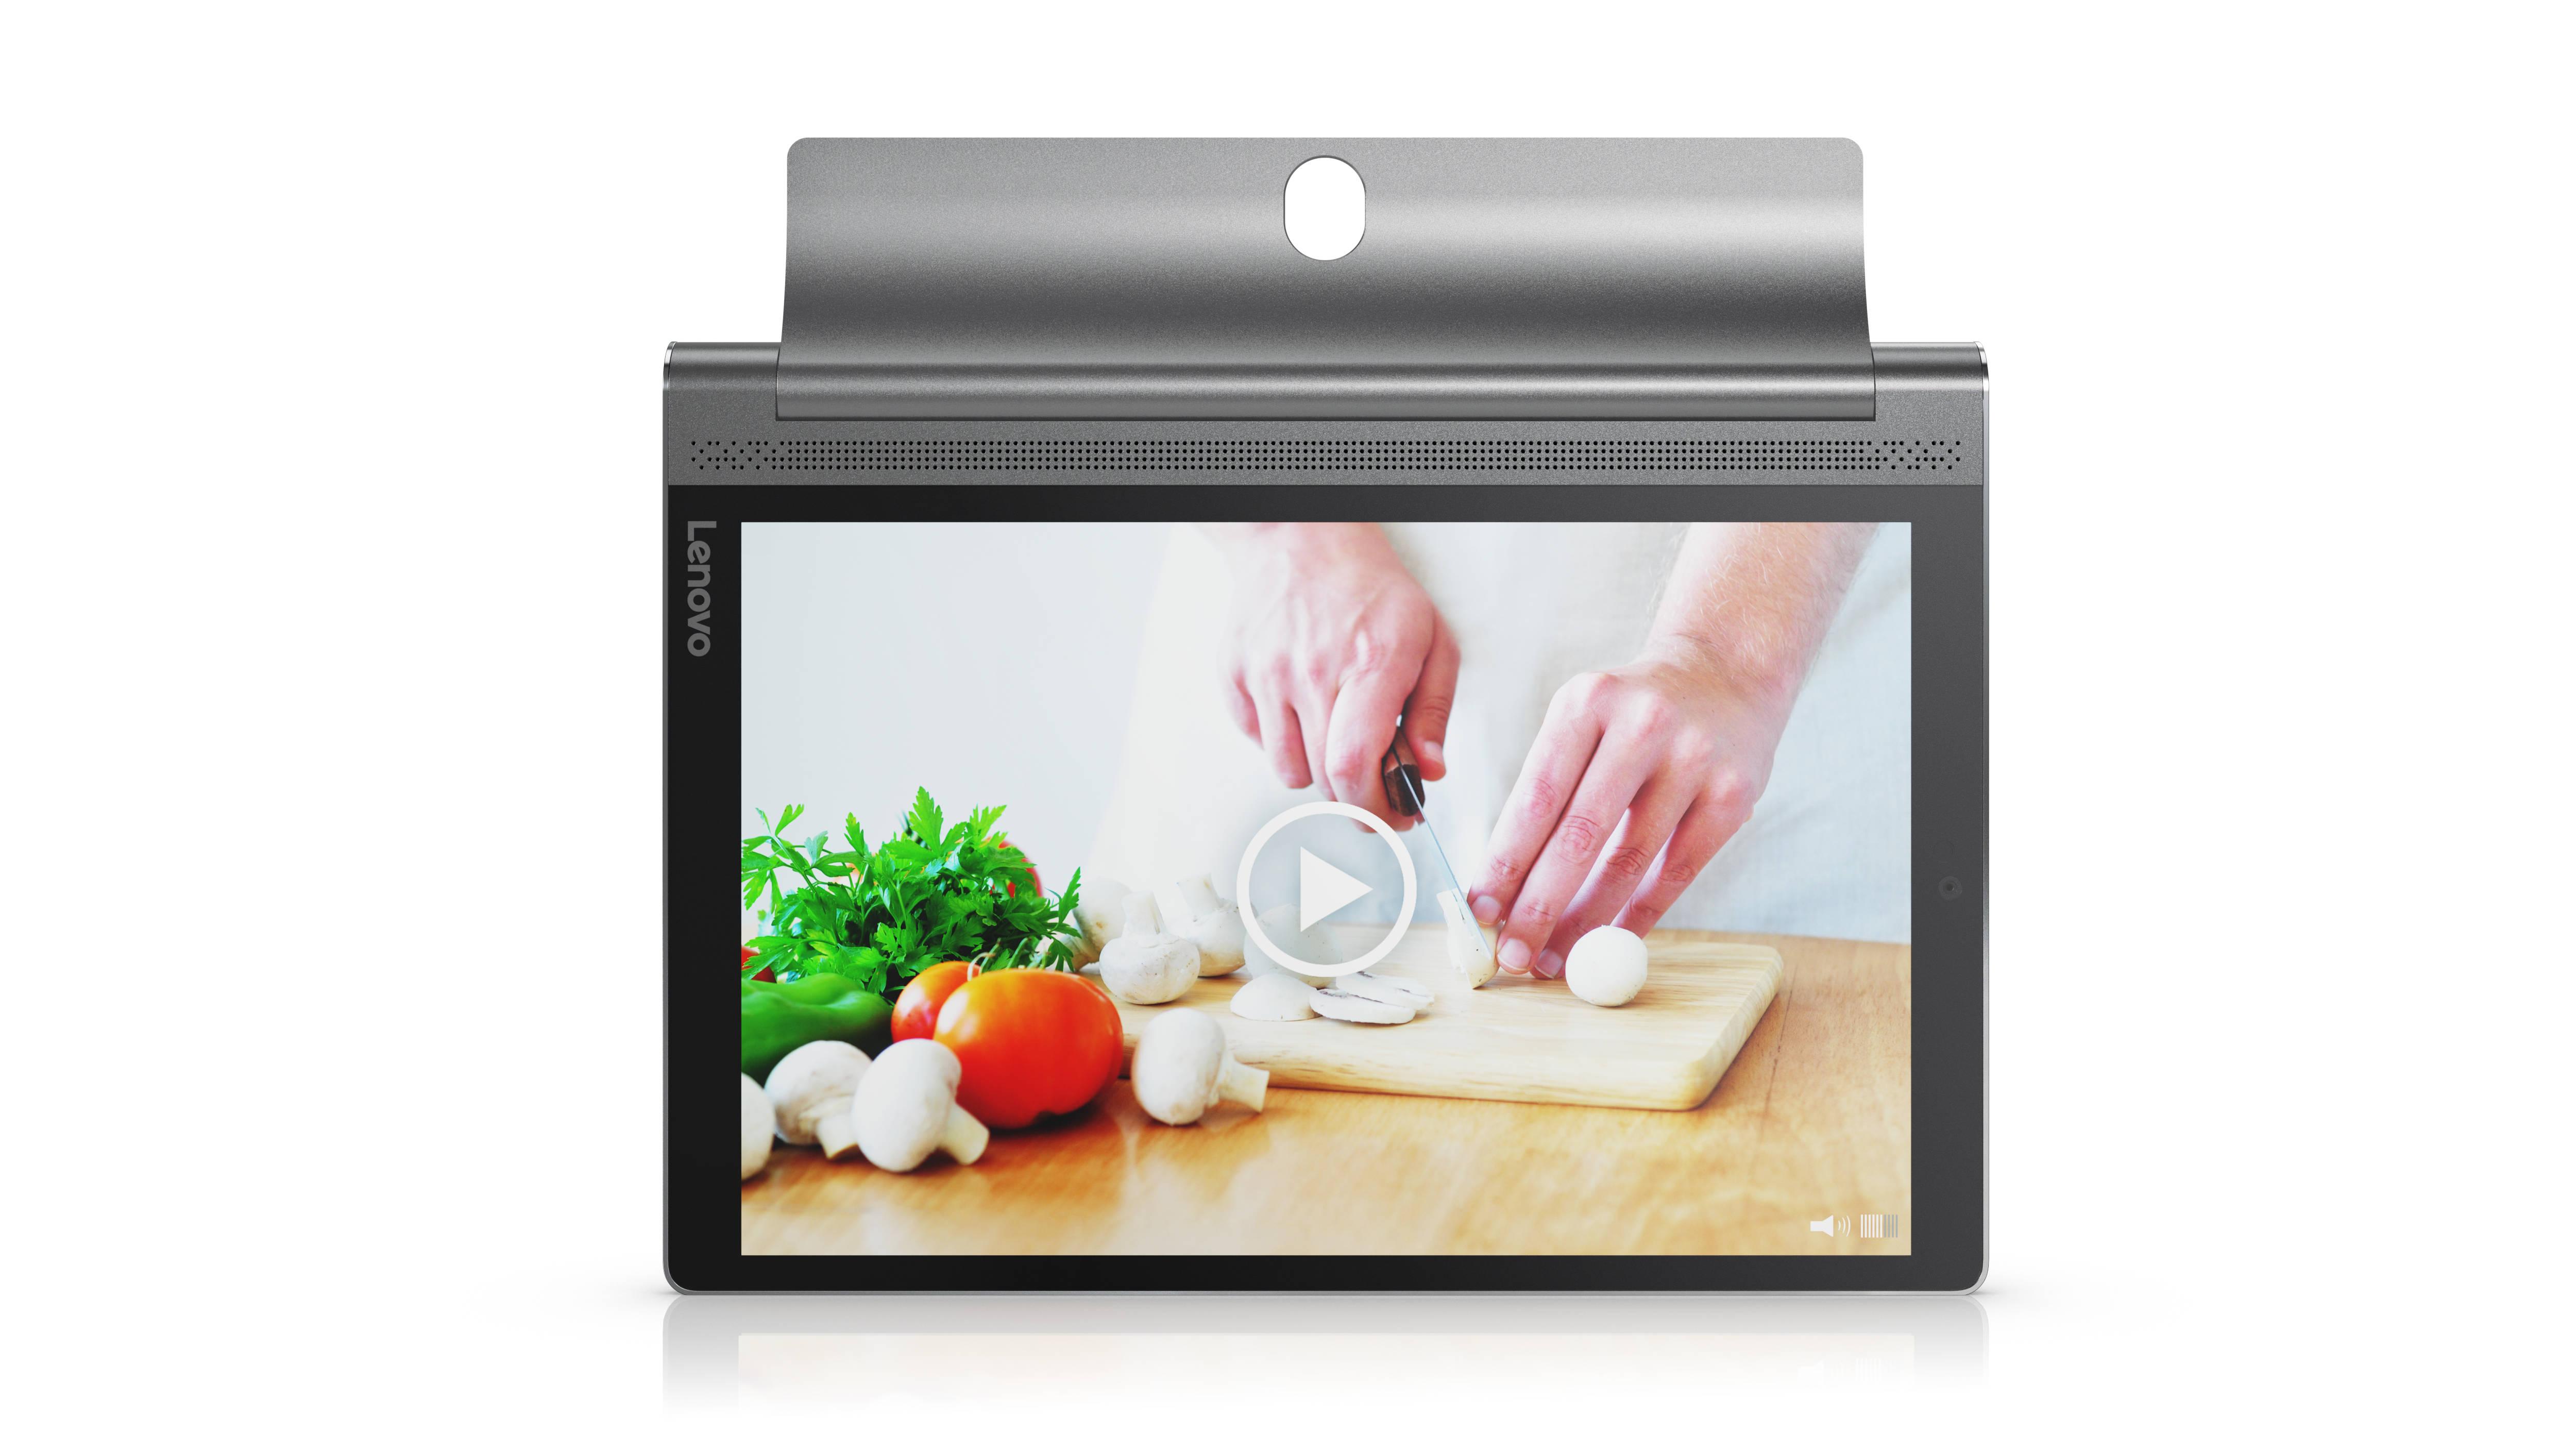 "YOGA Tablet 3 PLUS Snapdragon 1,8GHz/3GB/32GB/10,1"" IPS/2560x1600/Foto 13MPx/Android6.0 černá ZA1N0025CZ"